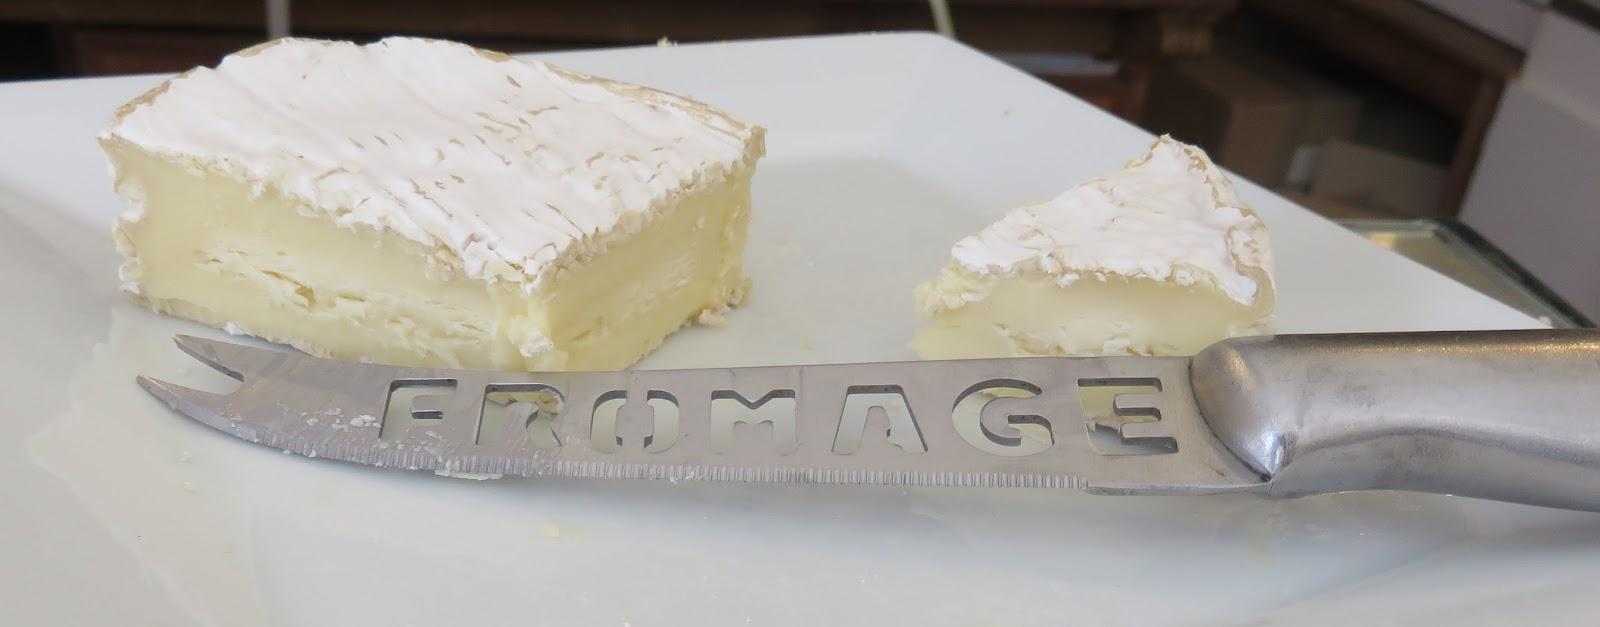 camembert-fromagerie-durand.jpg